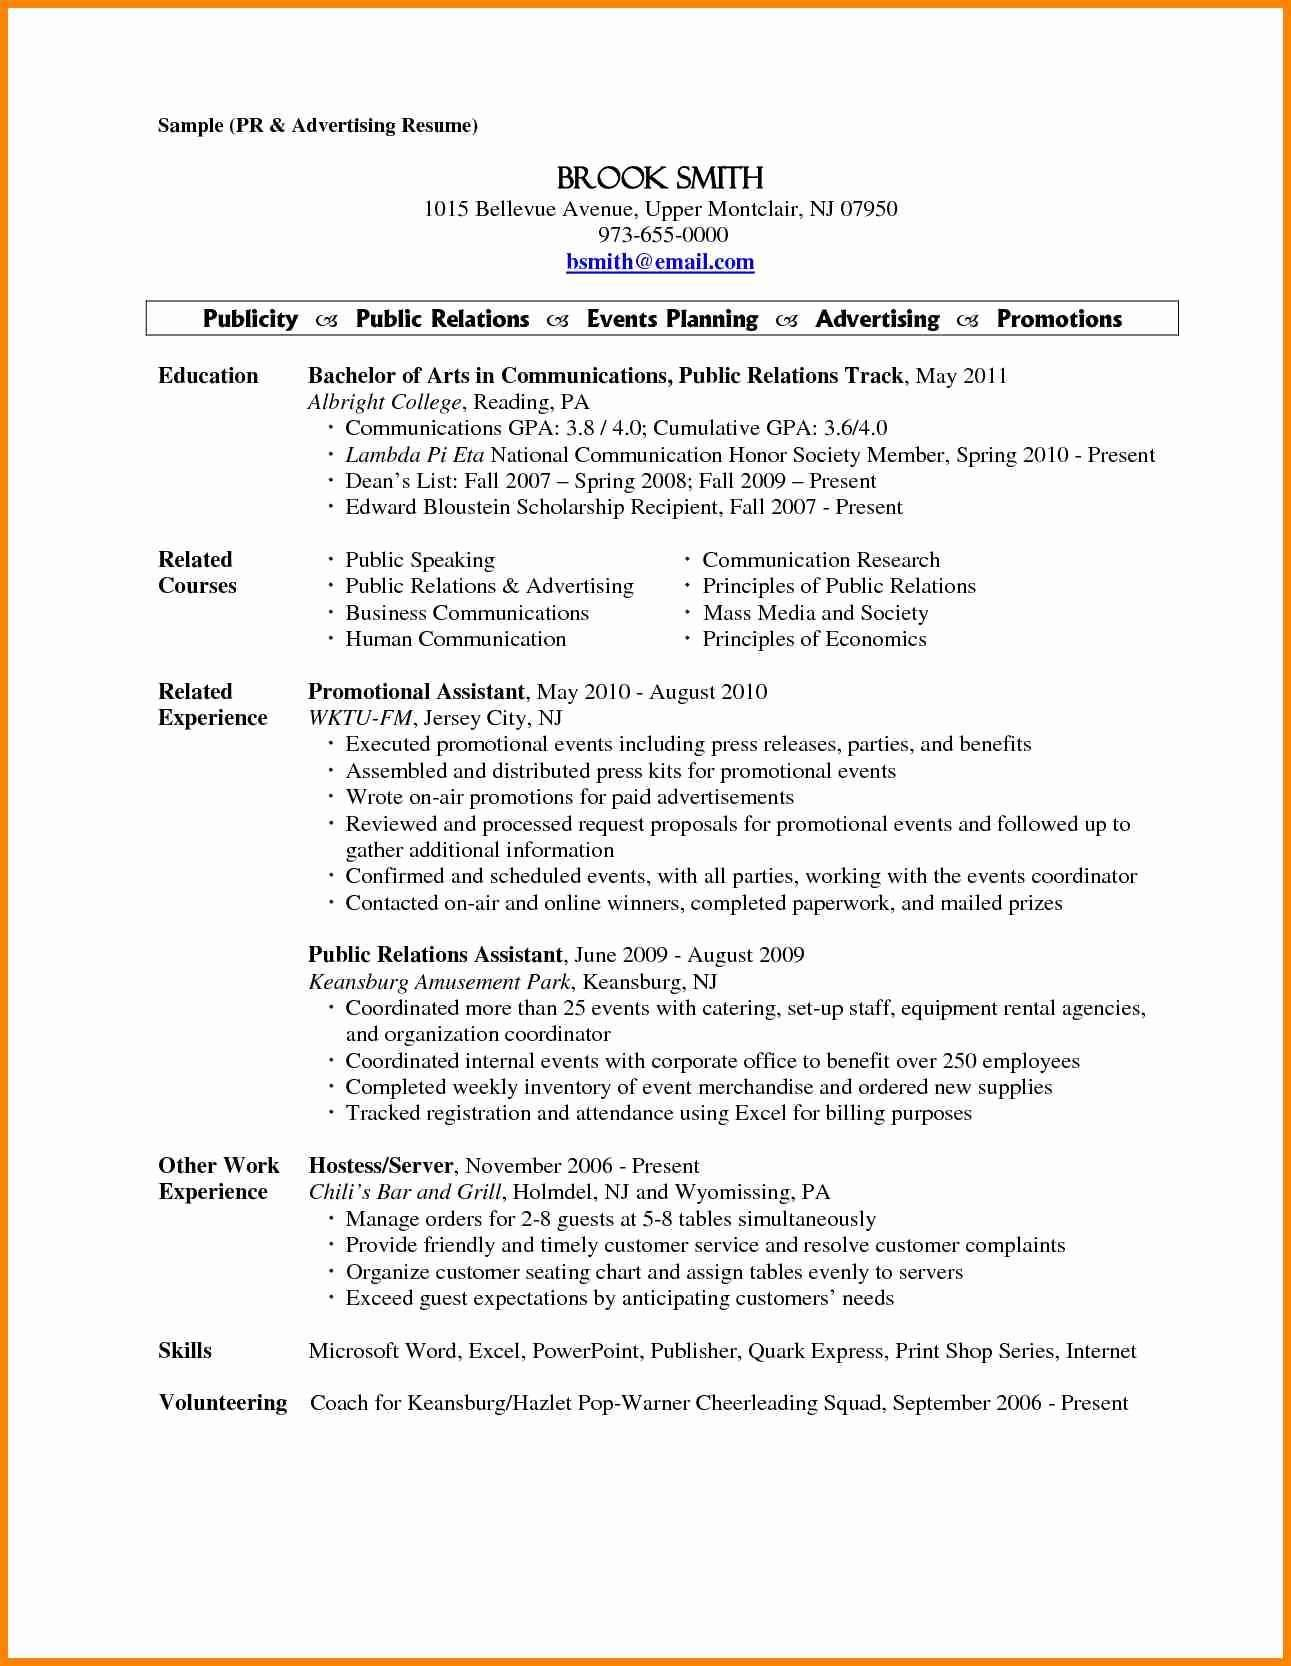 Sales Representative Job Description Sample Resume